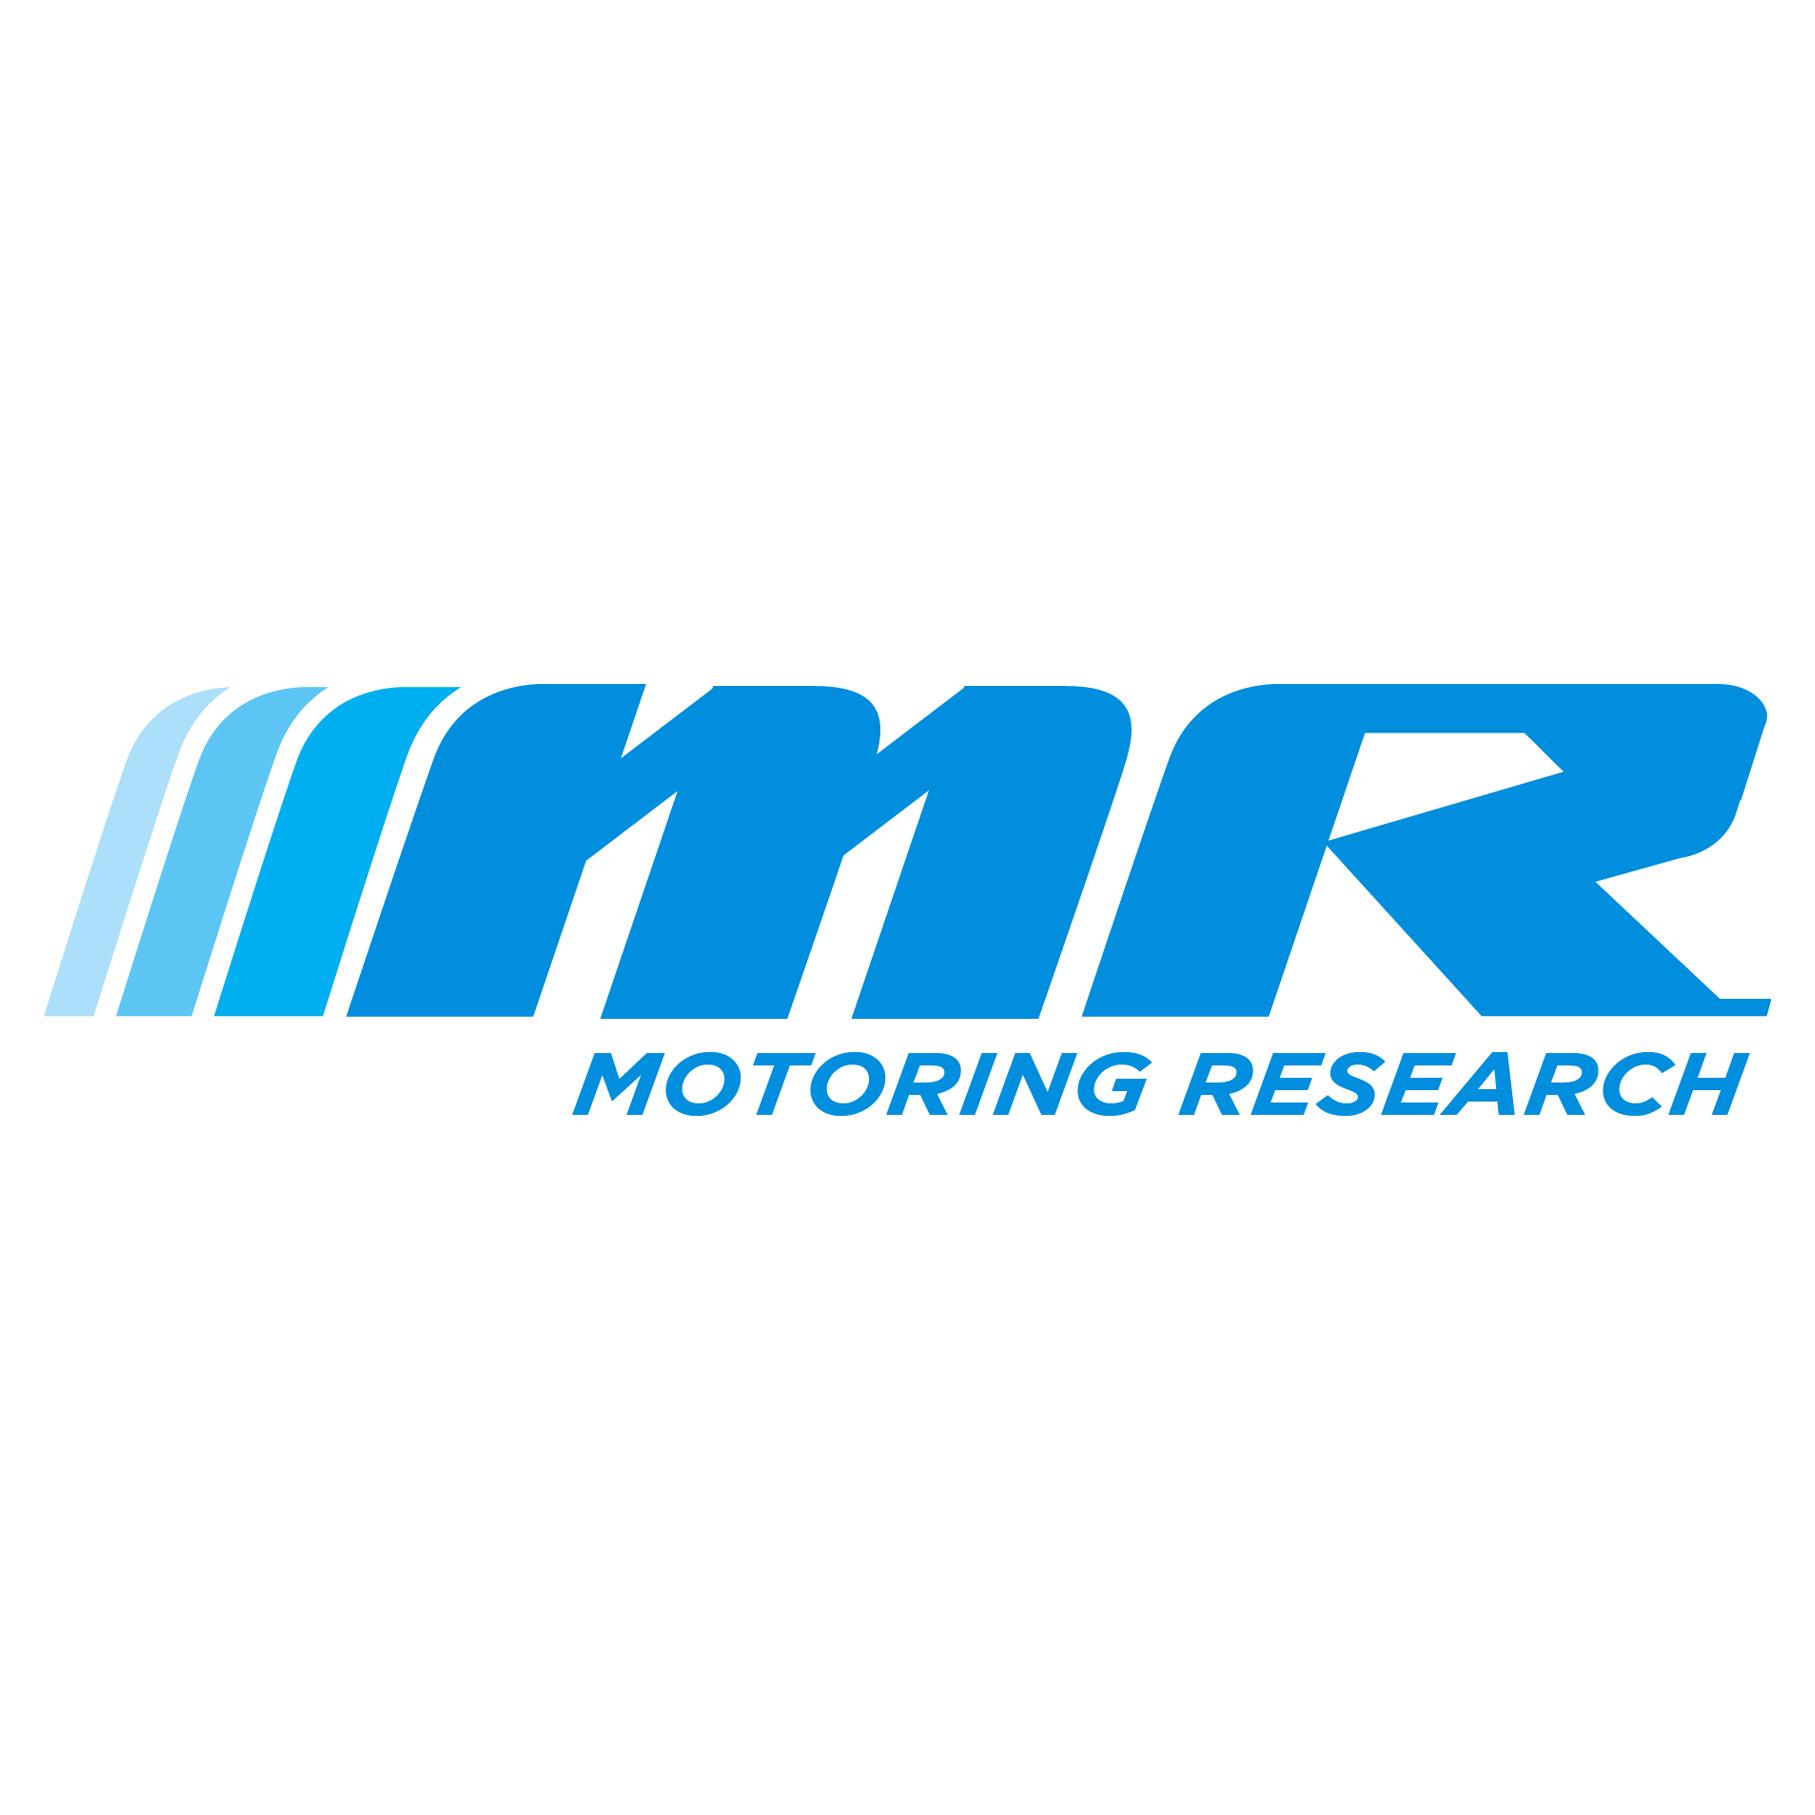 www.motoringresearch.com